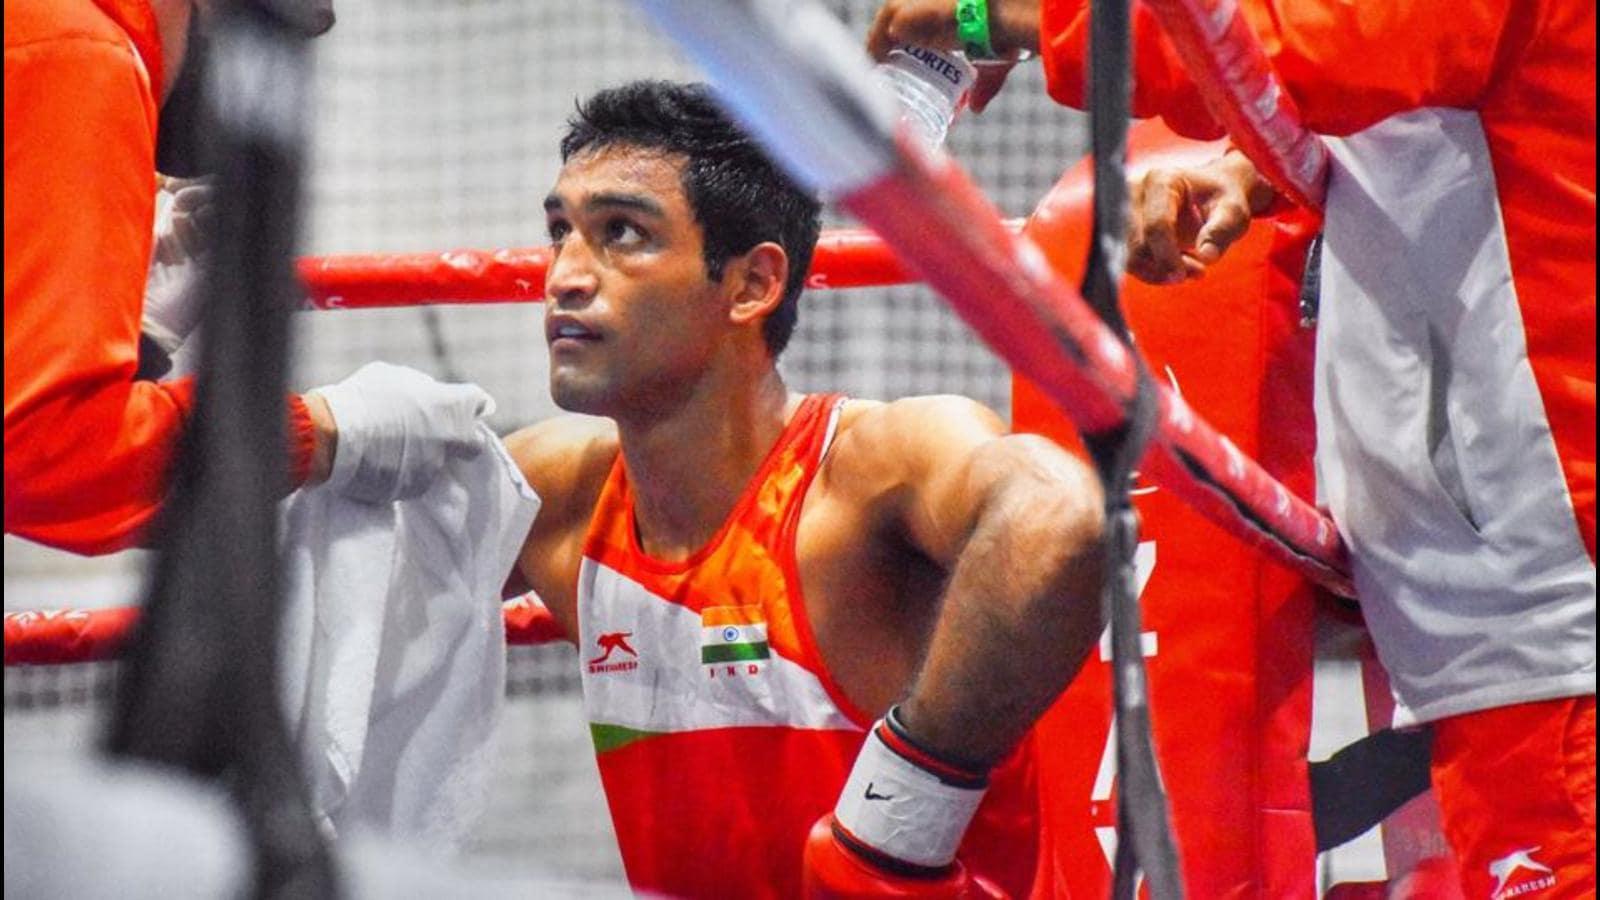 Boxer Ashish Kumar: chasing success at Tokyo 2020, burnished by failures - Hindustan Times